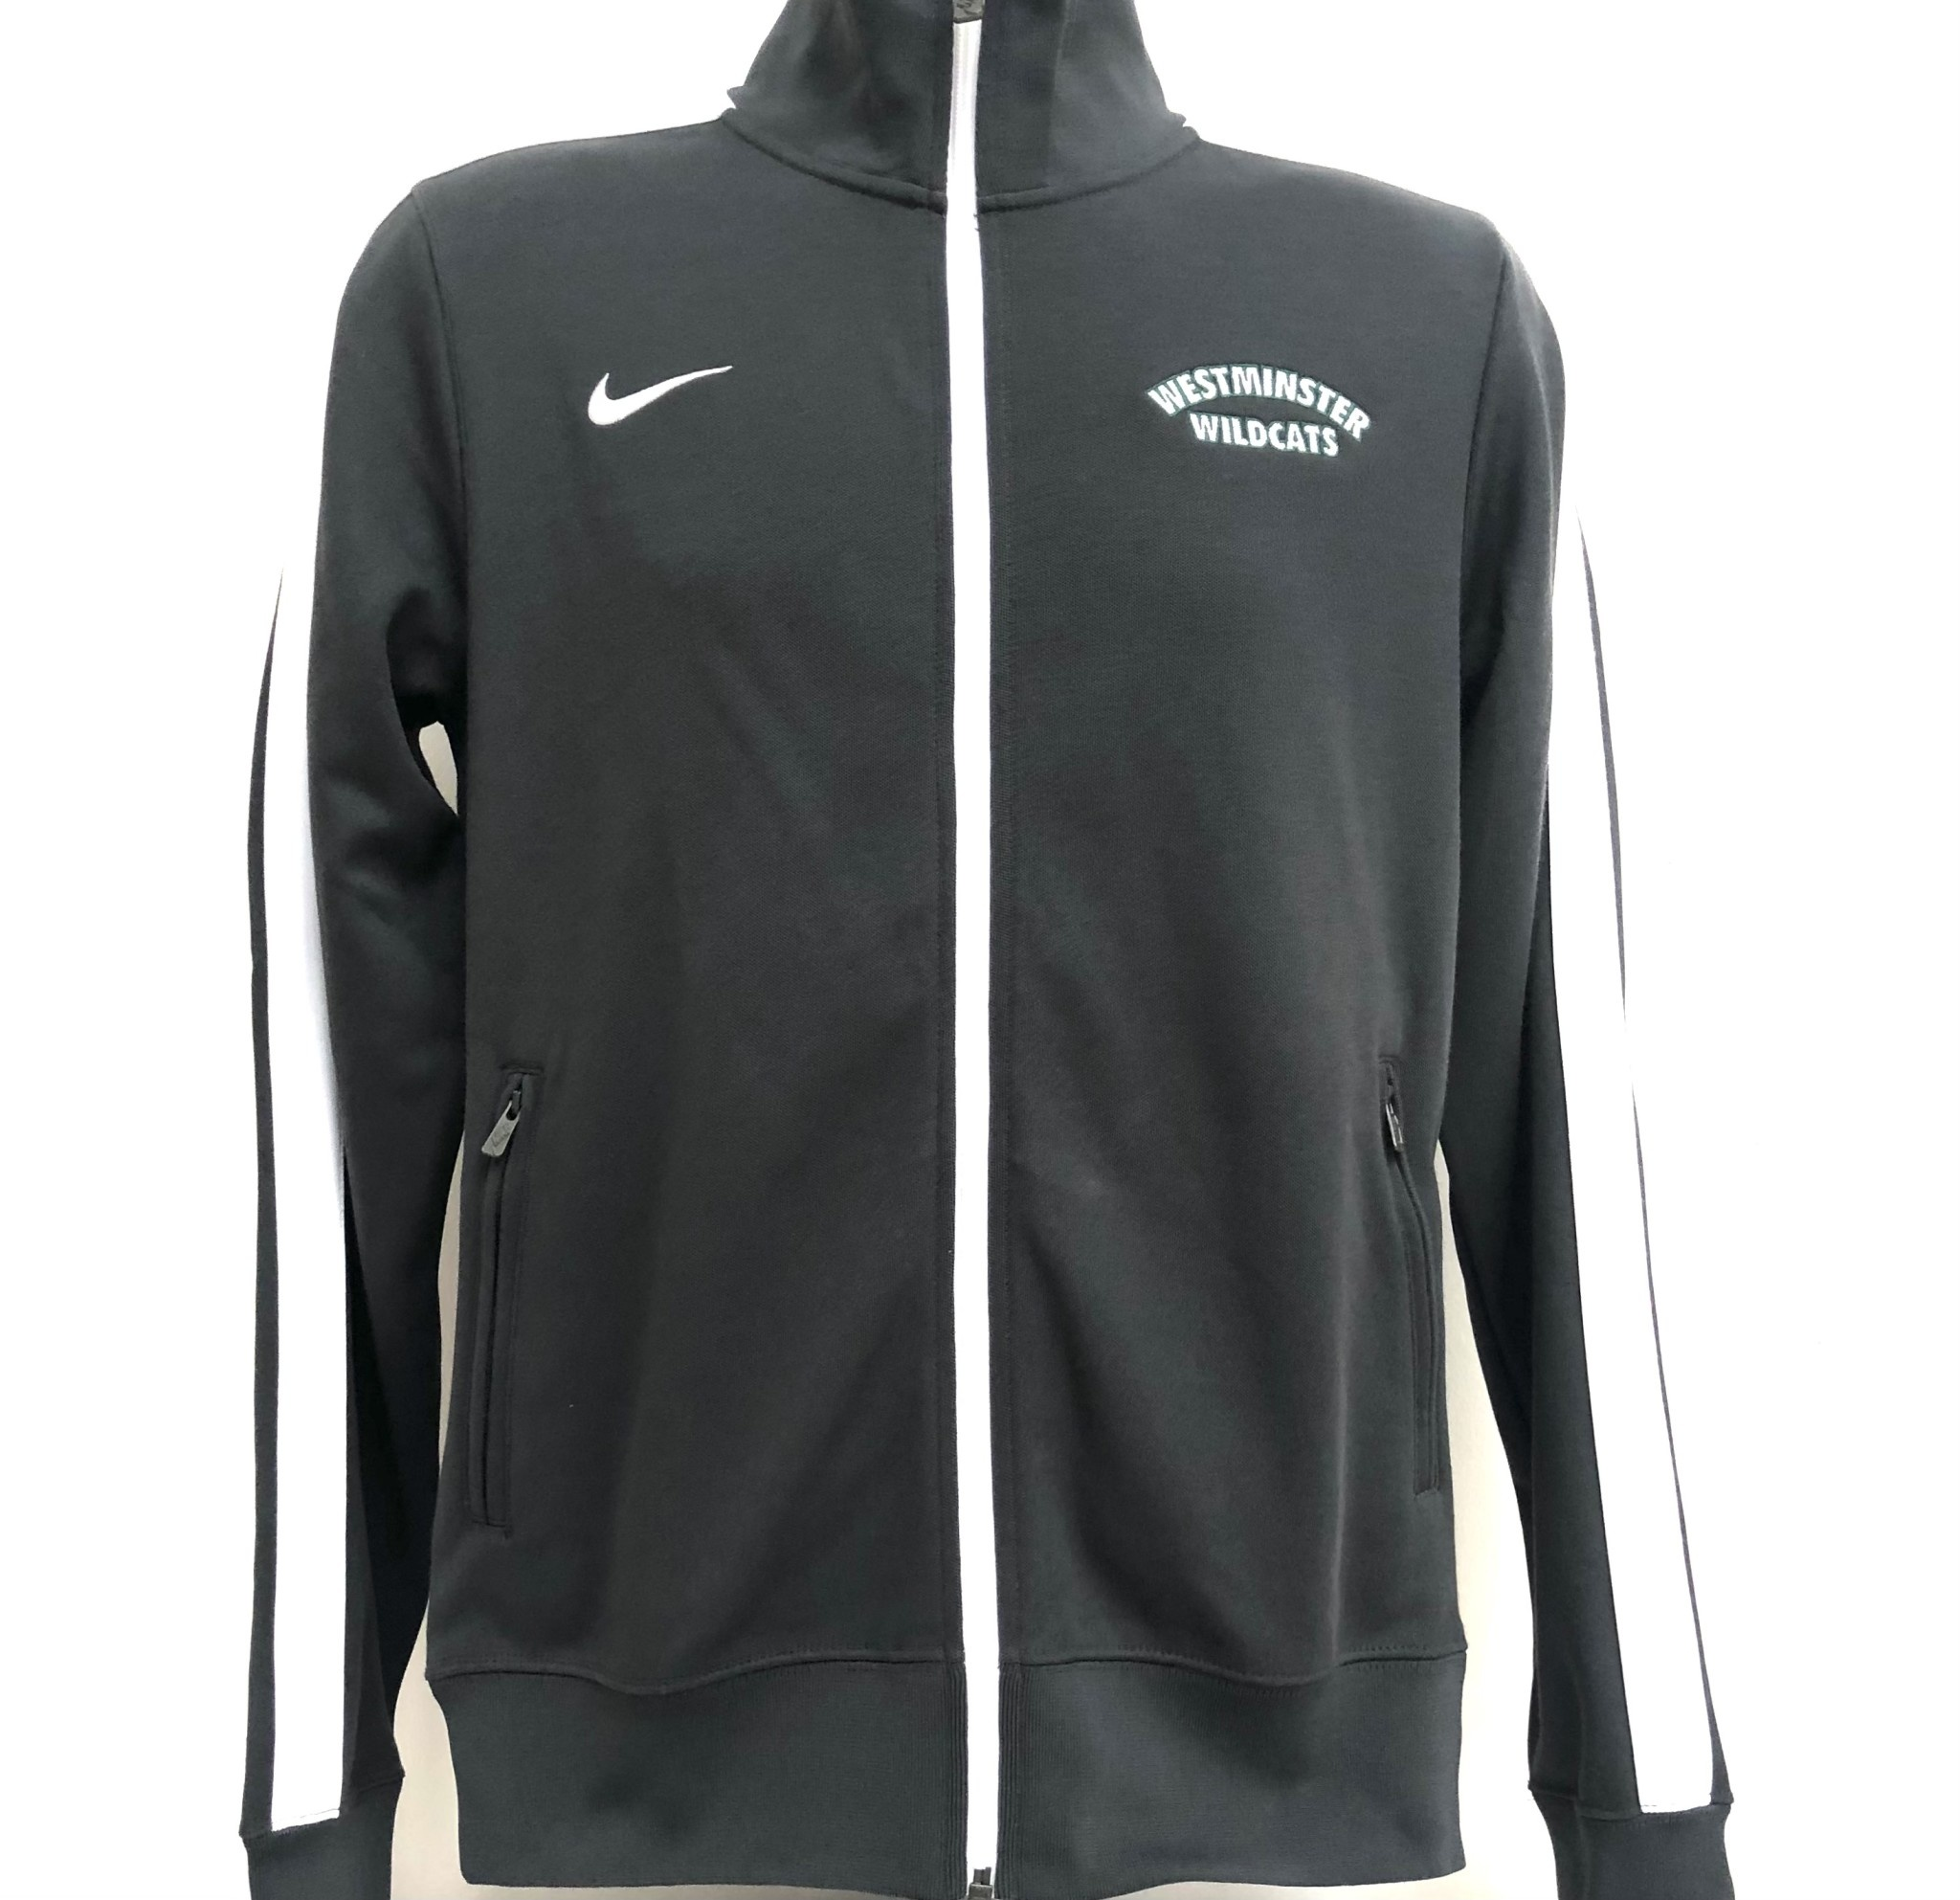 Nike Jacket: NIKE N98 Anthracite